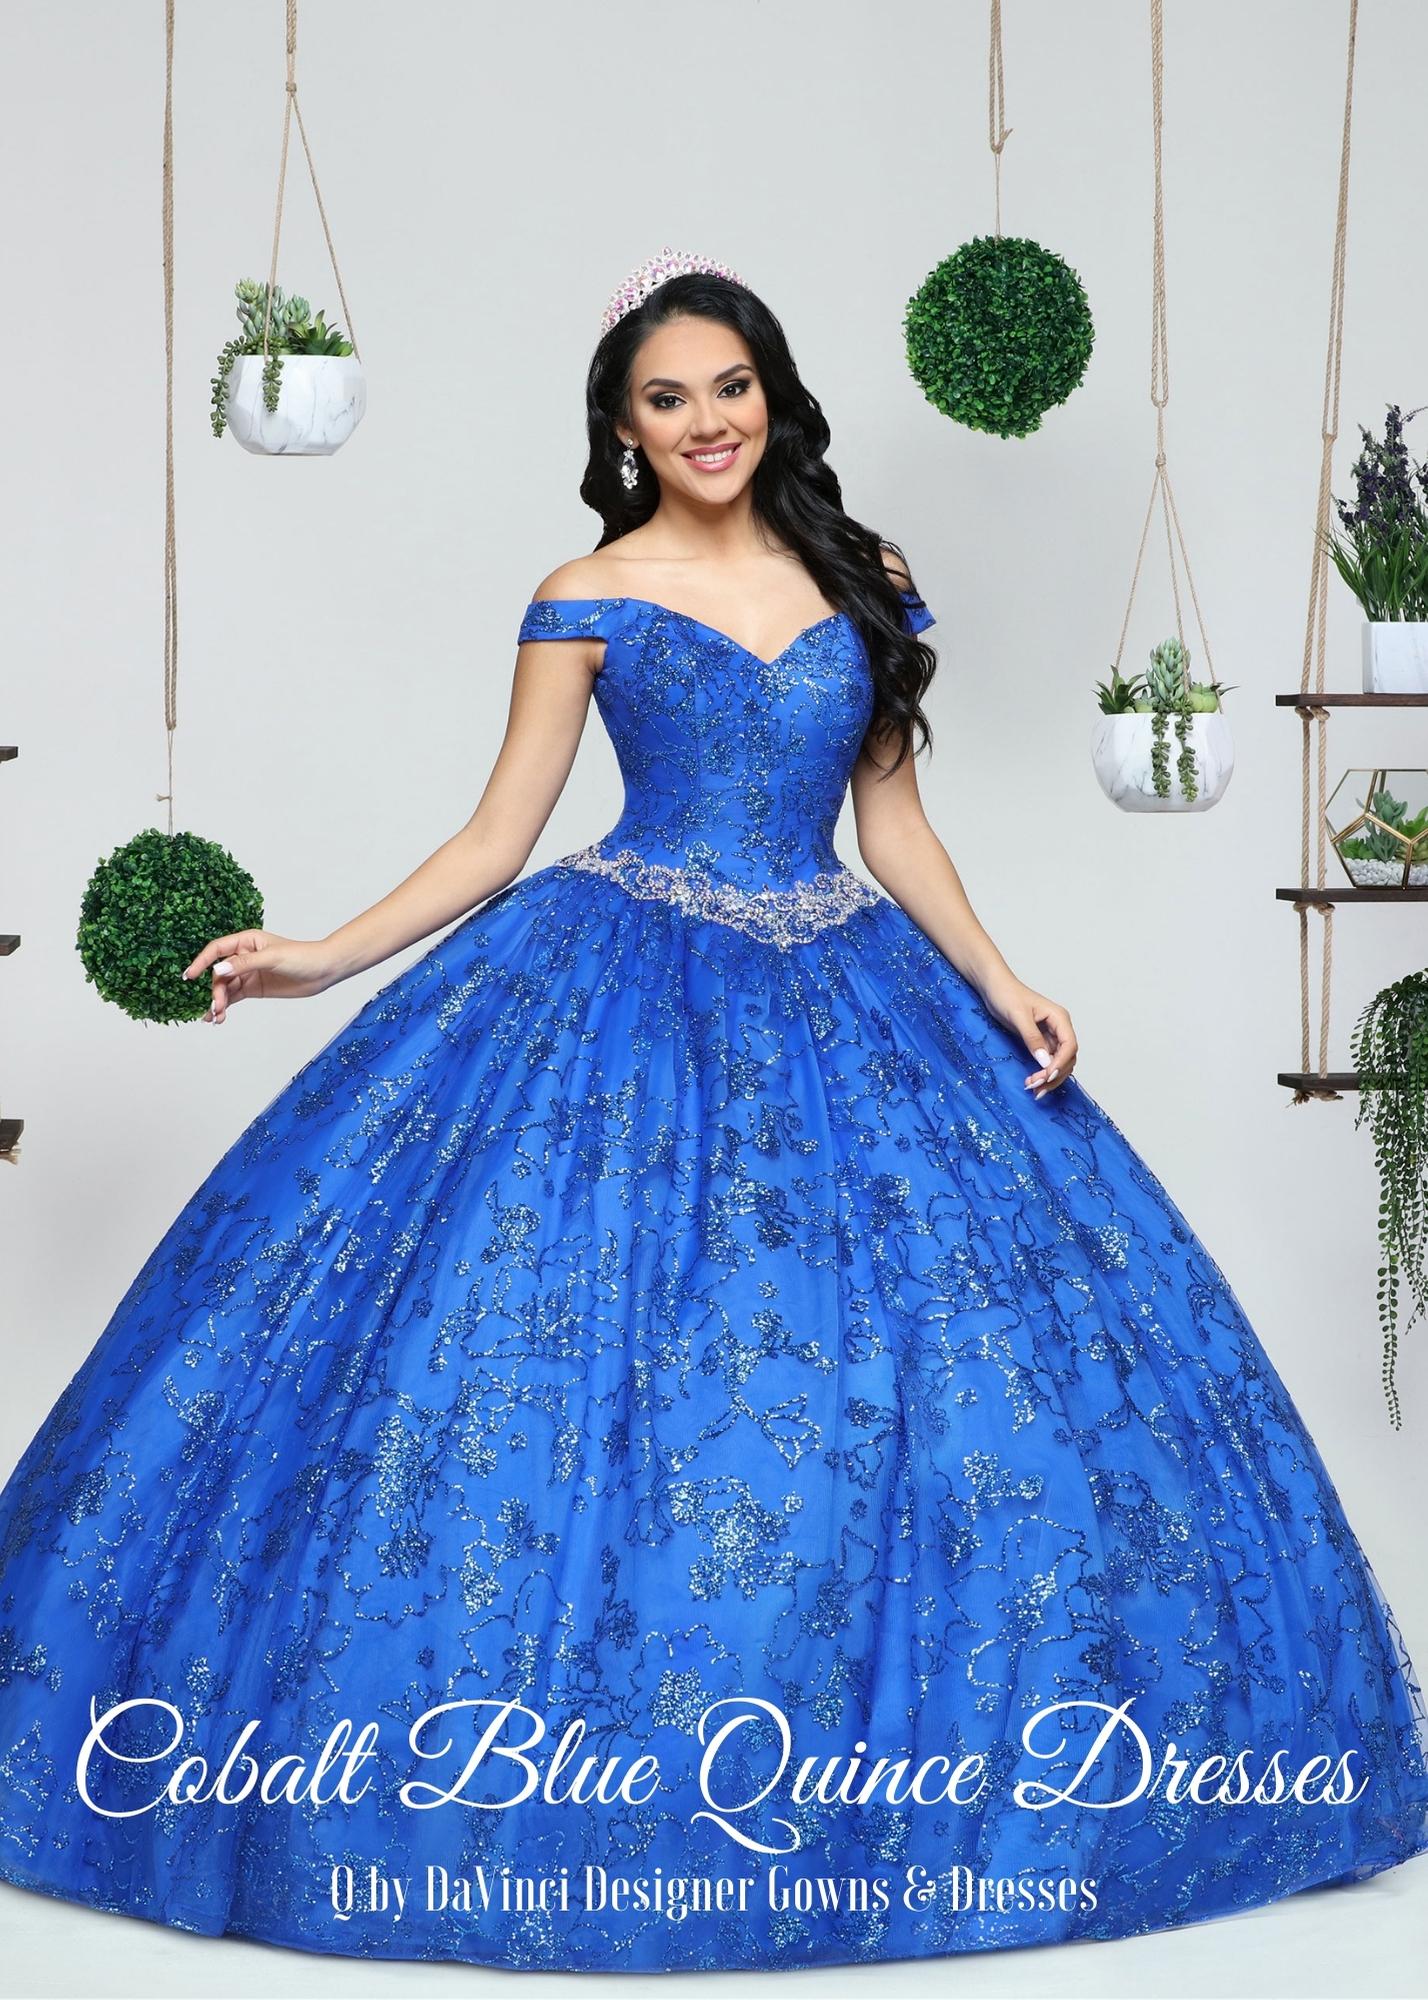 Bright Cobalt Blue Quinceanera Dresses for 2021 – Q by DaVinci